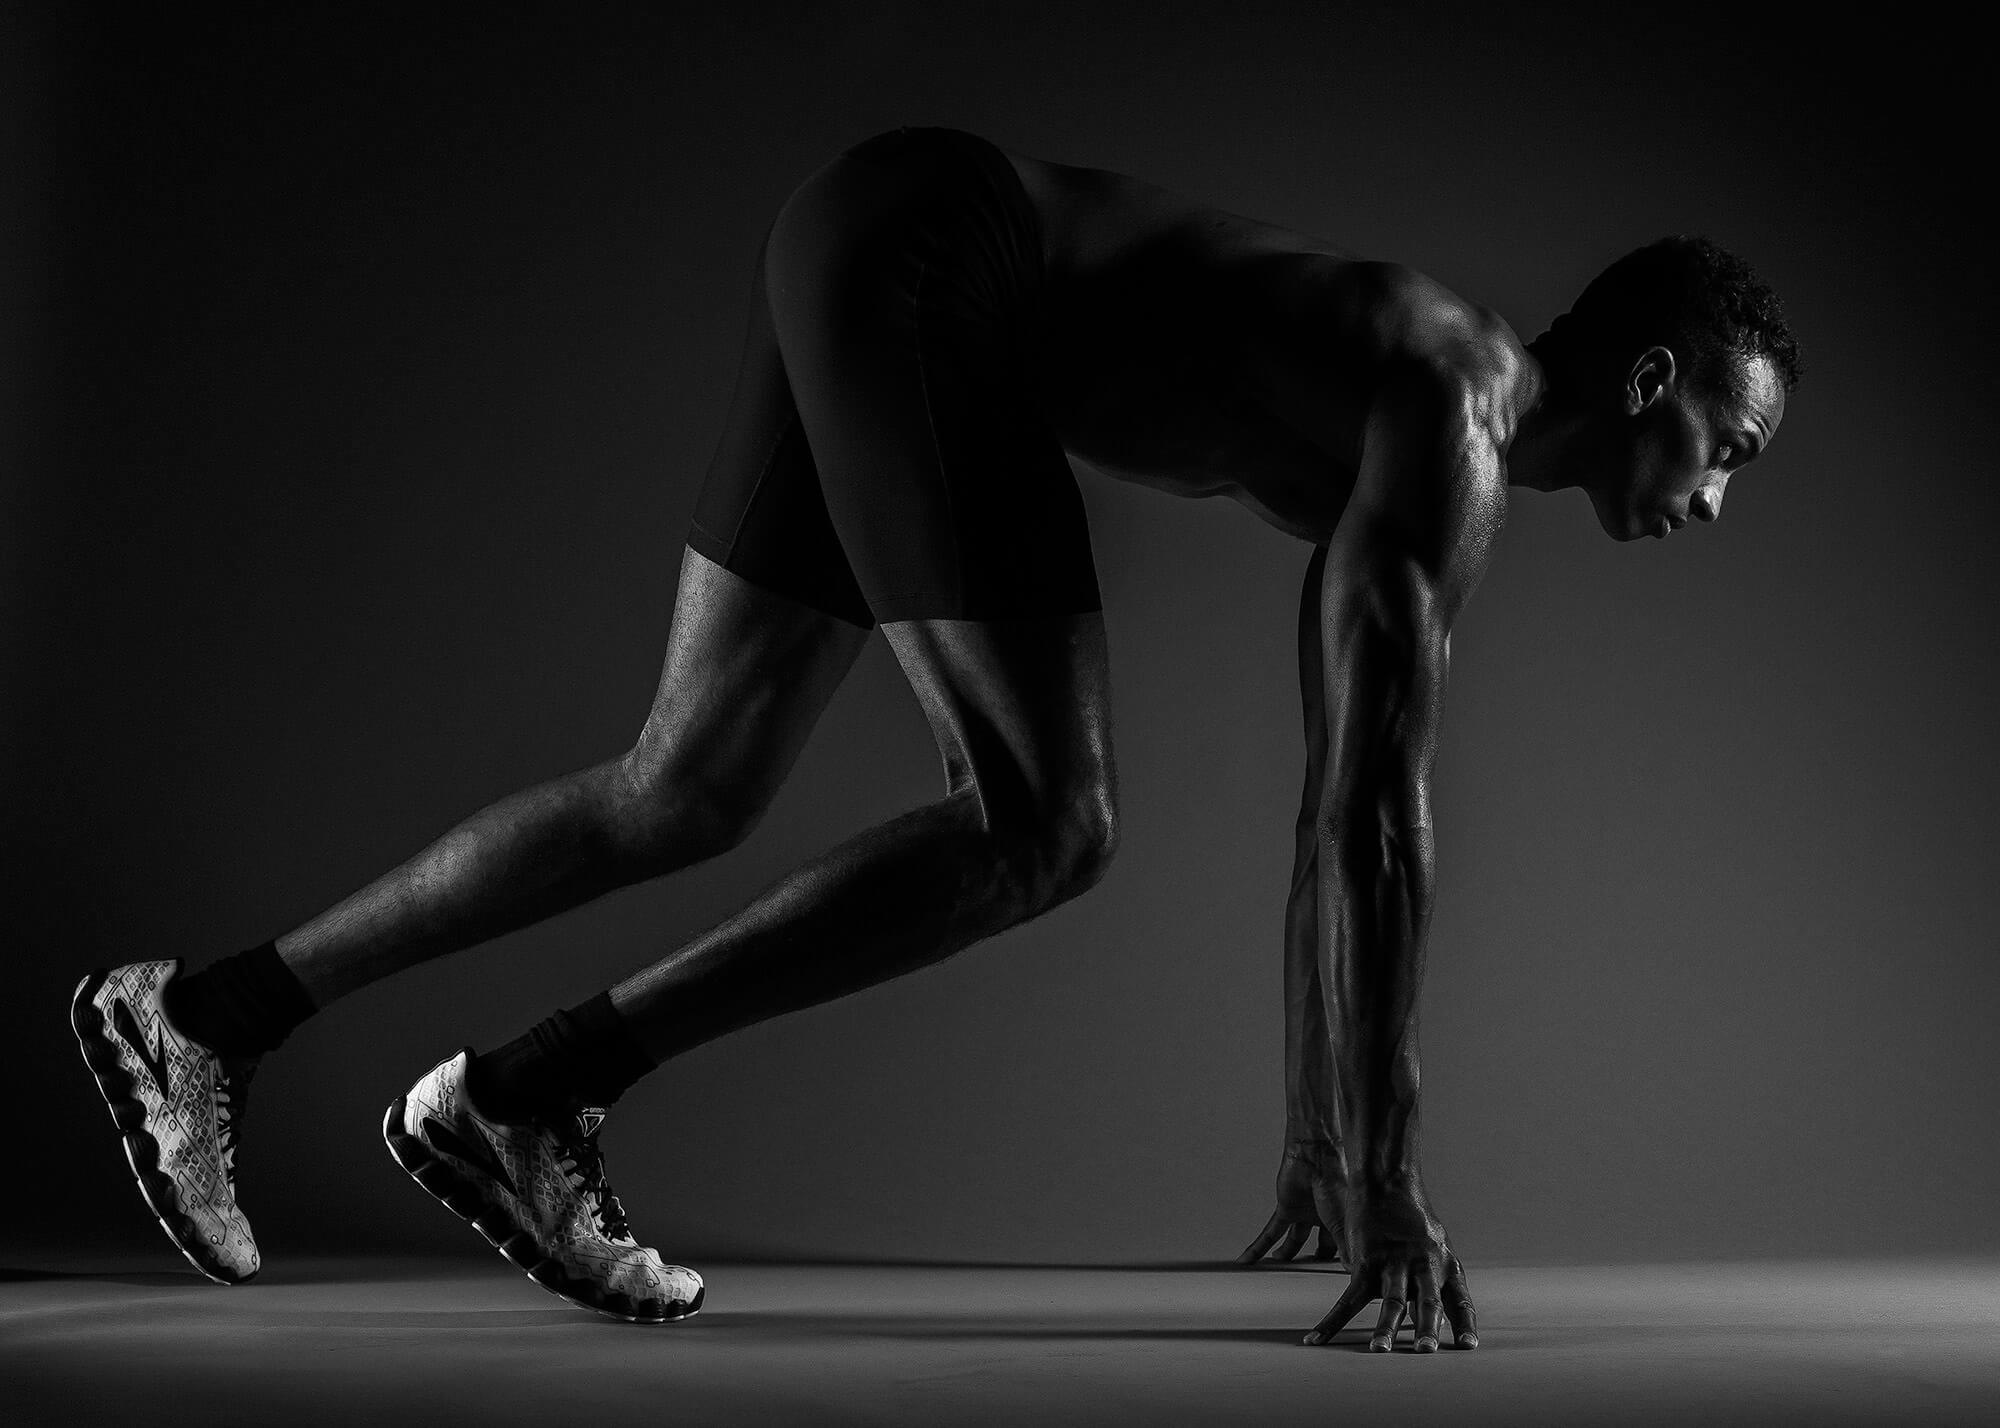 Track athlete posing in start position